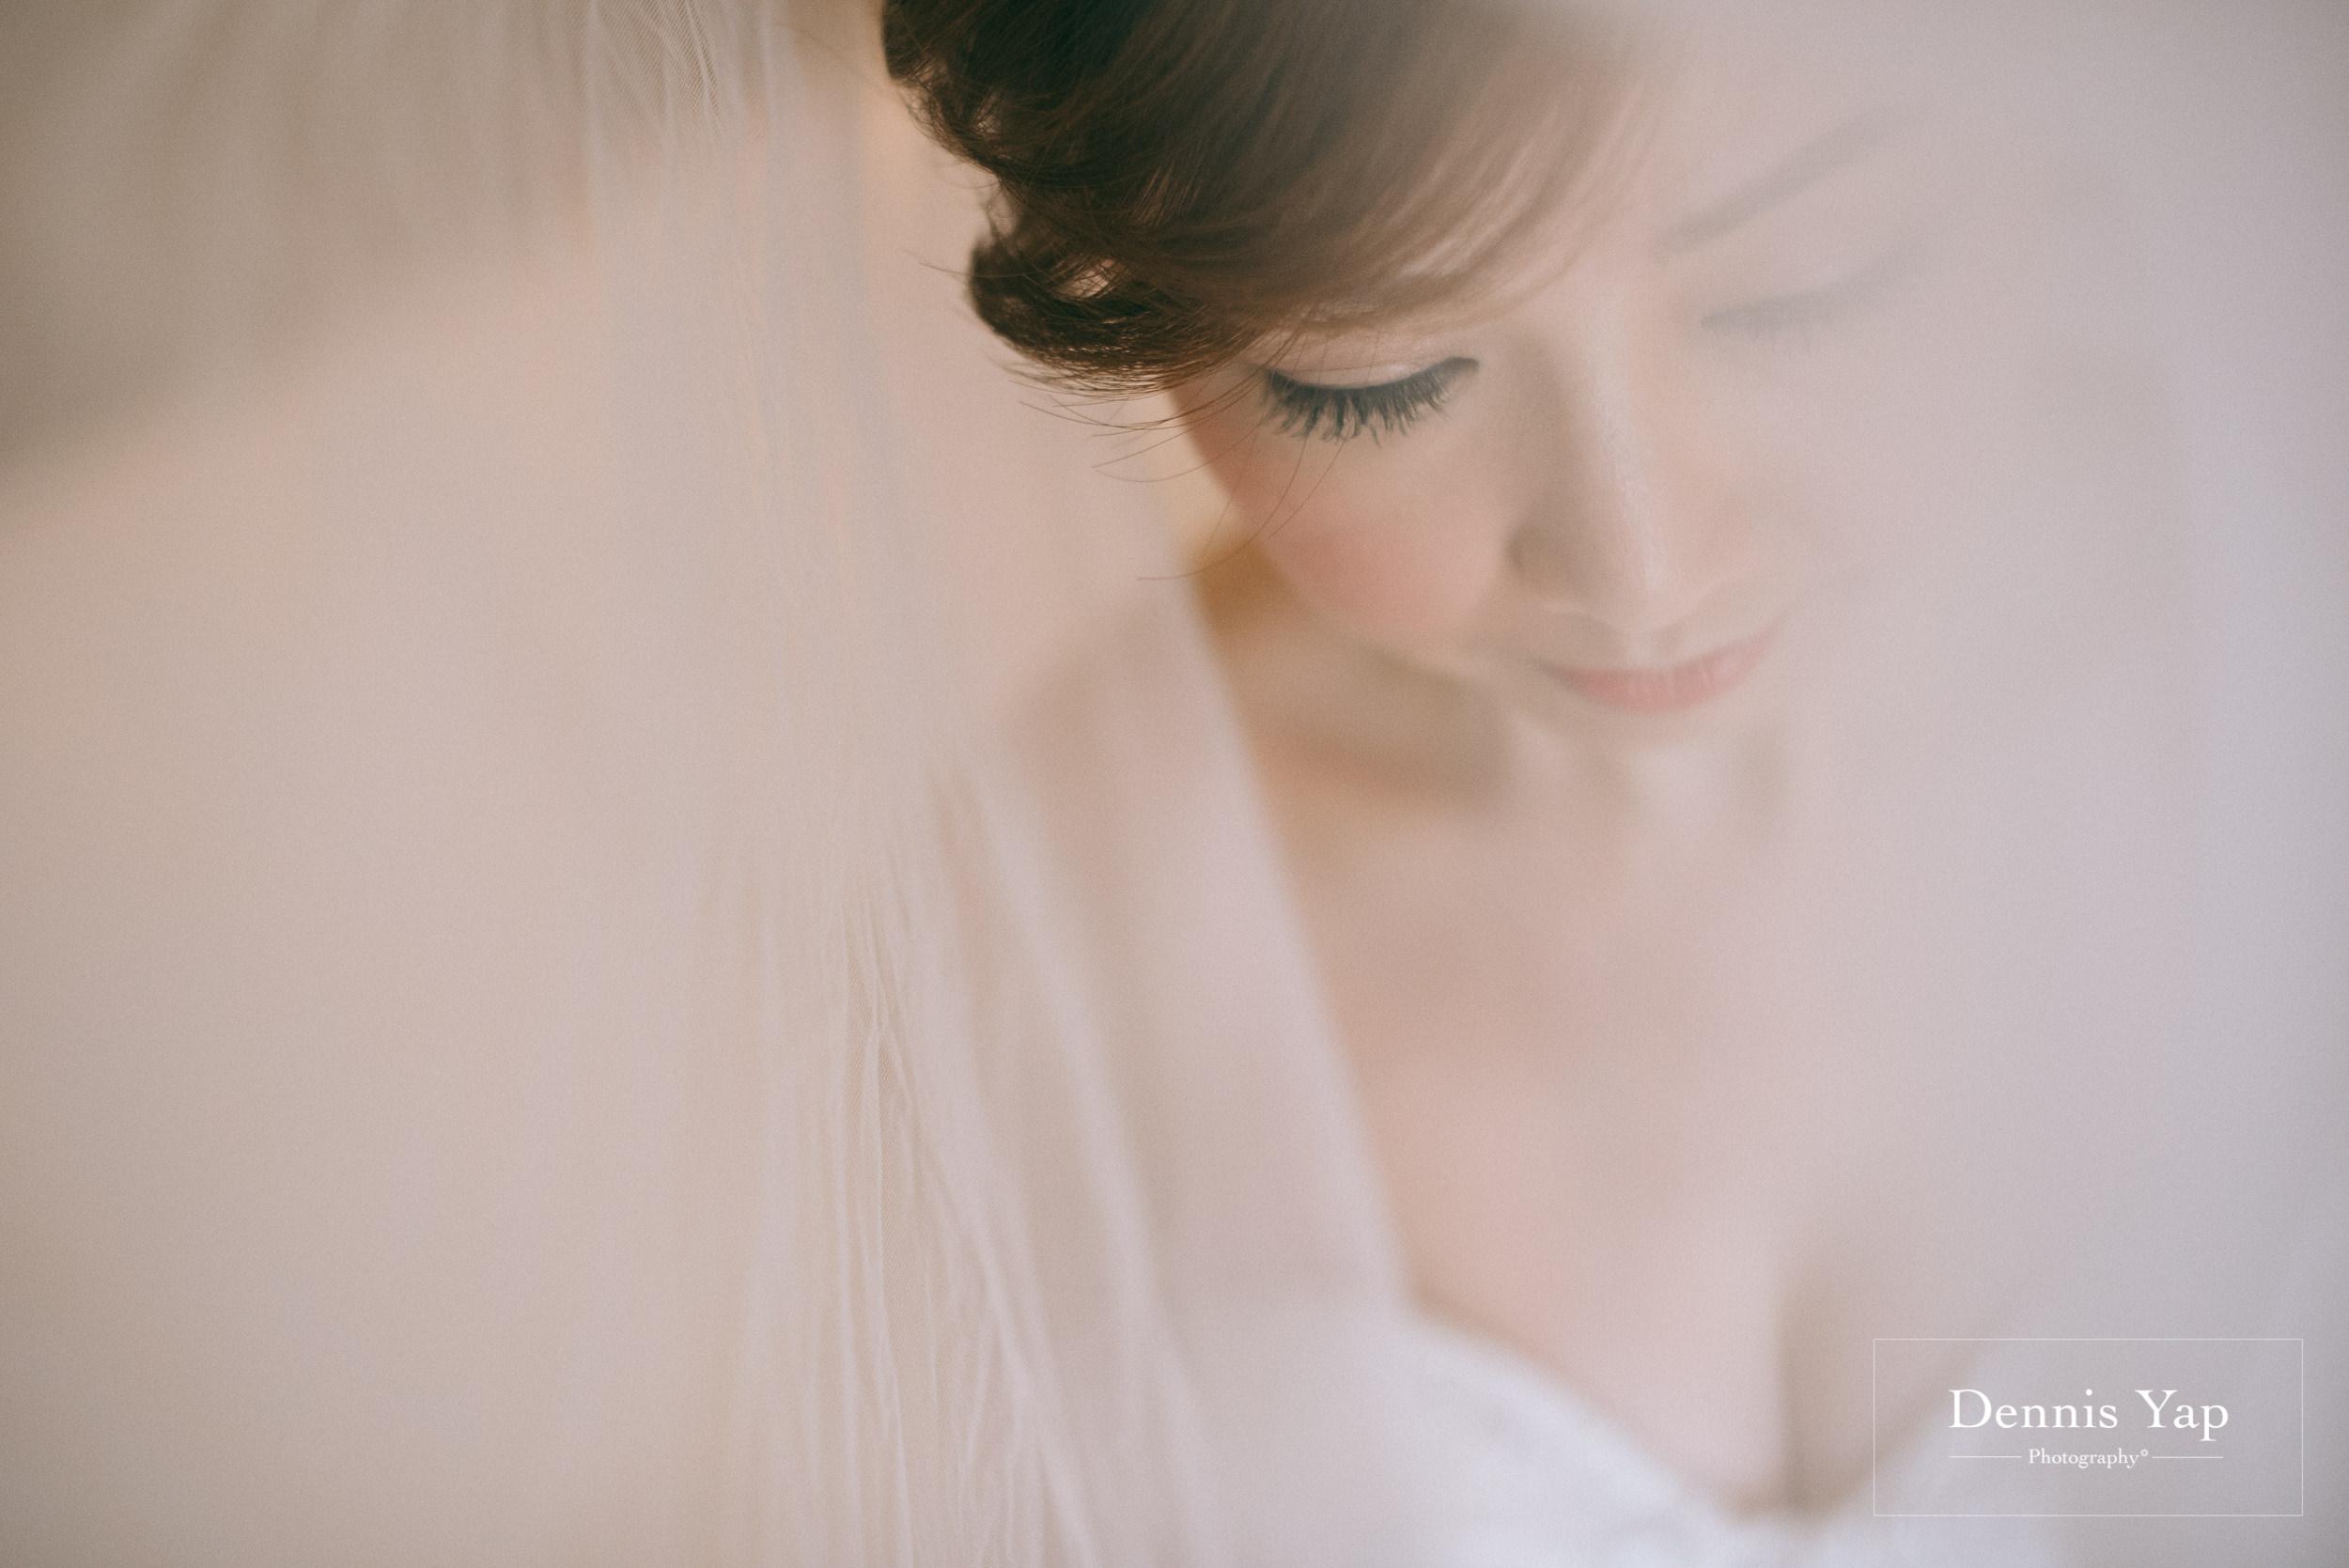 alex eivan wedding day kuala lumpur malaysia dennis yap photography short gown-4.jpg